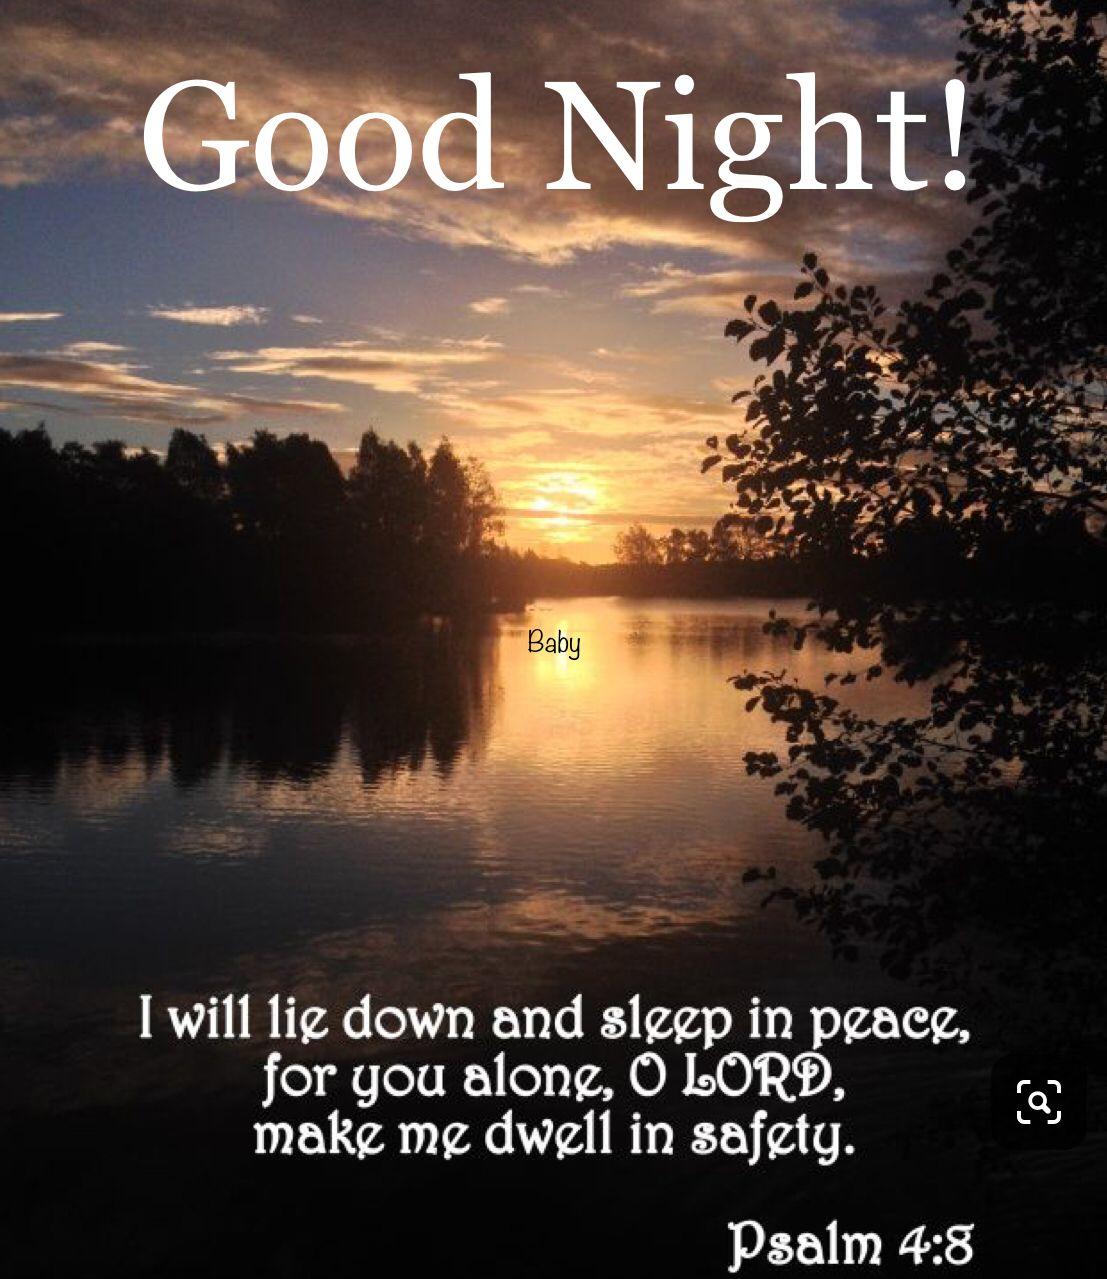 Good Night Good Night Blessings Good Night Bible Verse Good Night Prayer